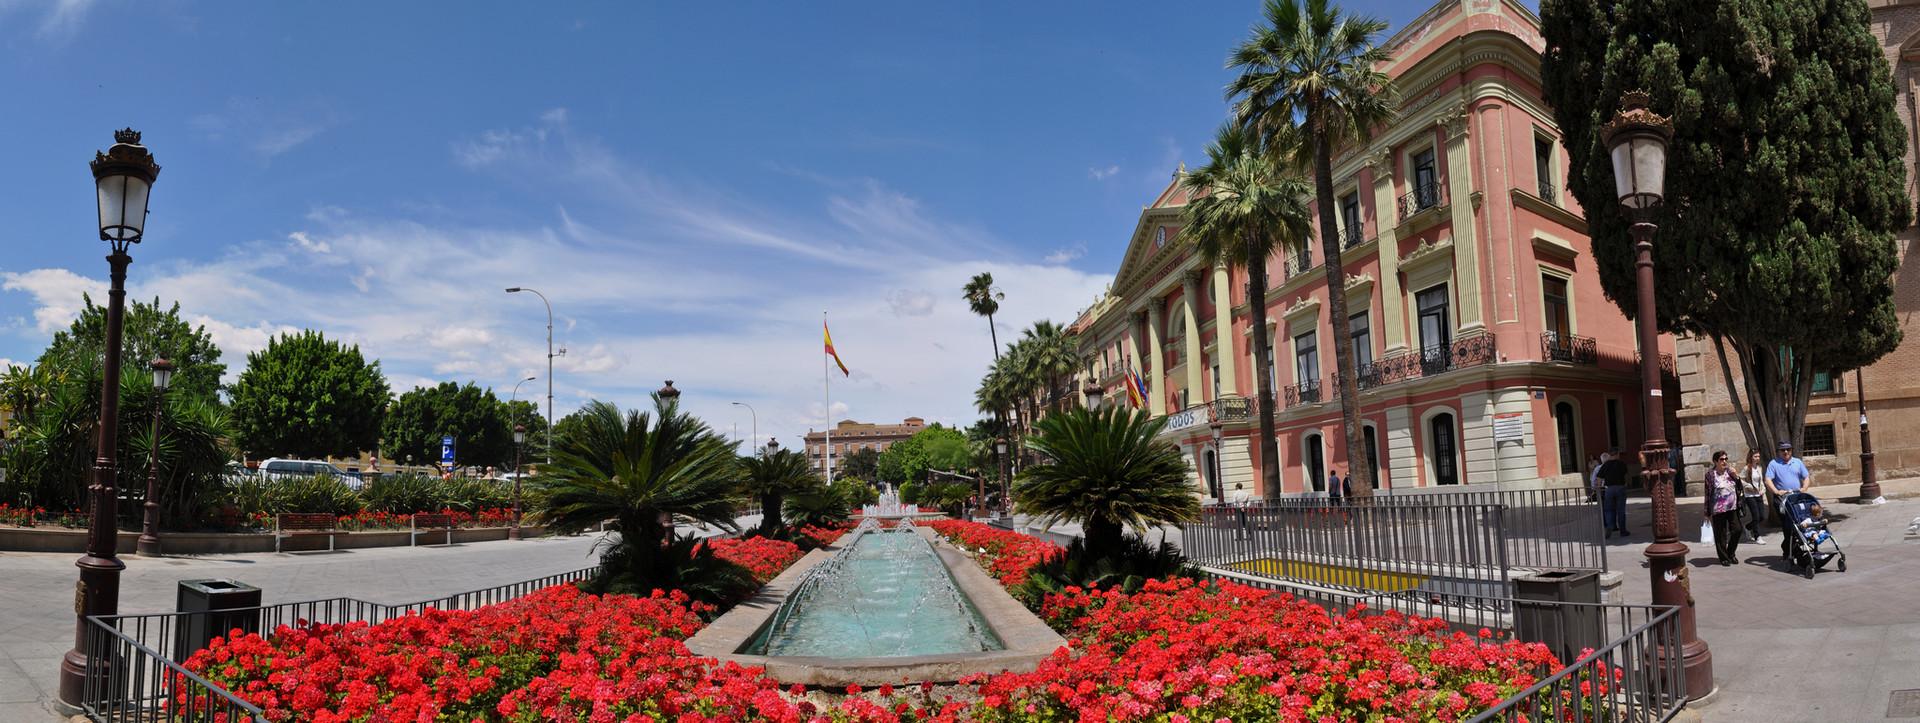 Erasmus experience in Murcia, Spain   Erasmus experience Murcia